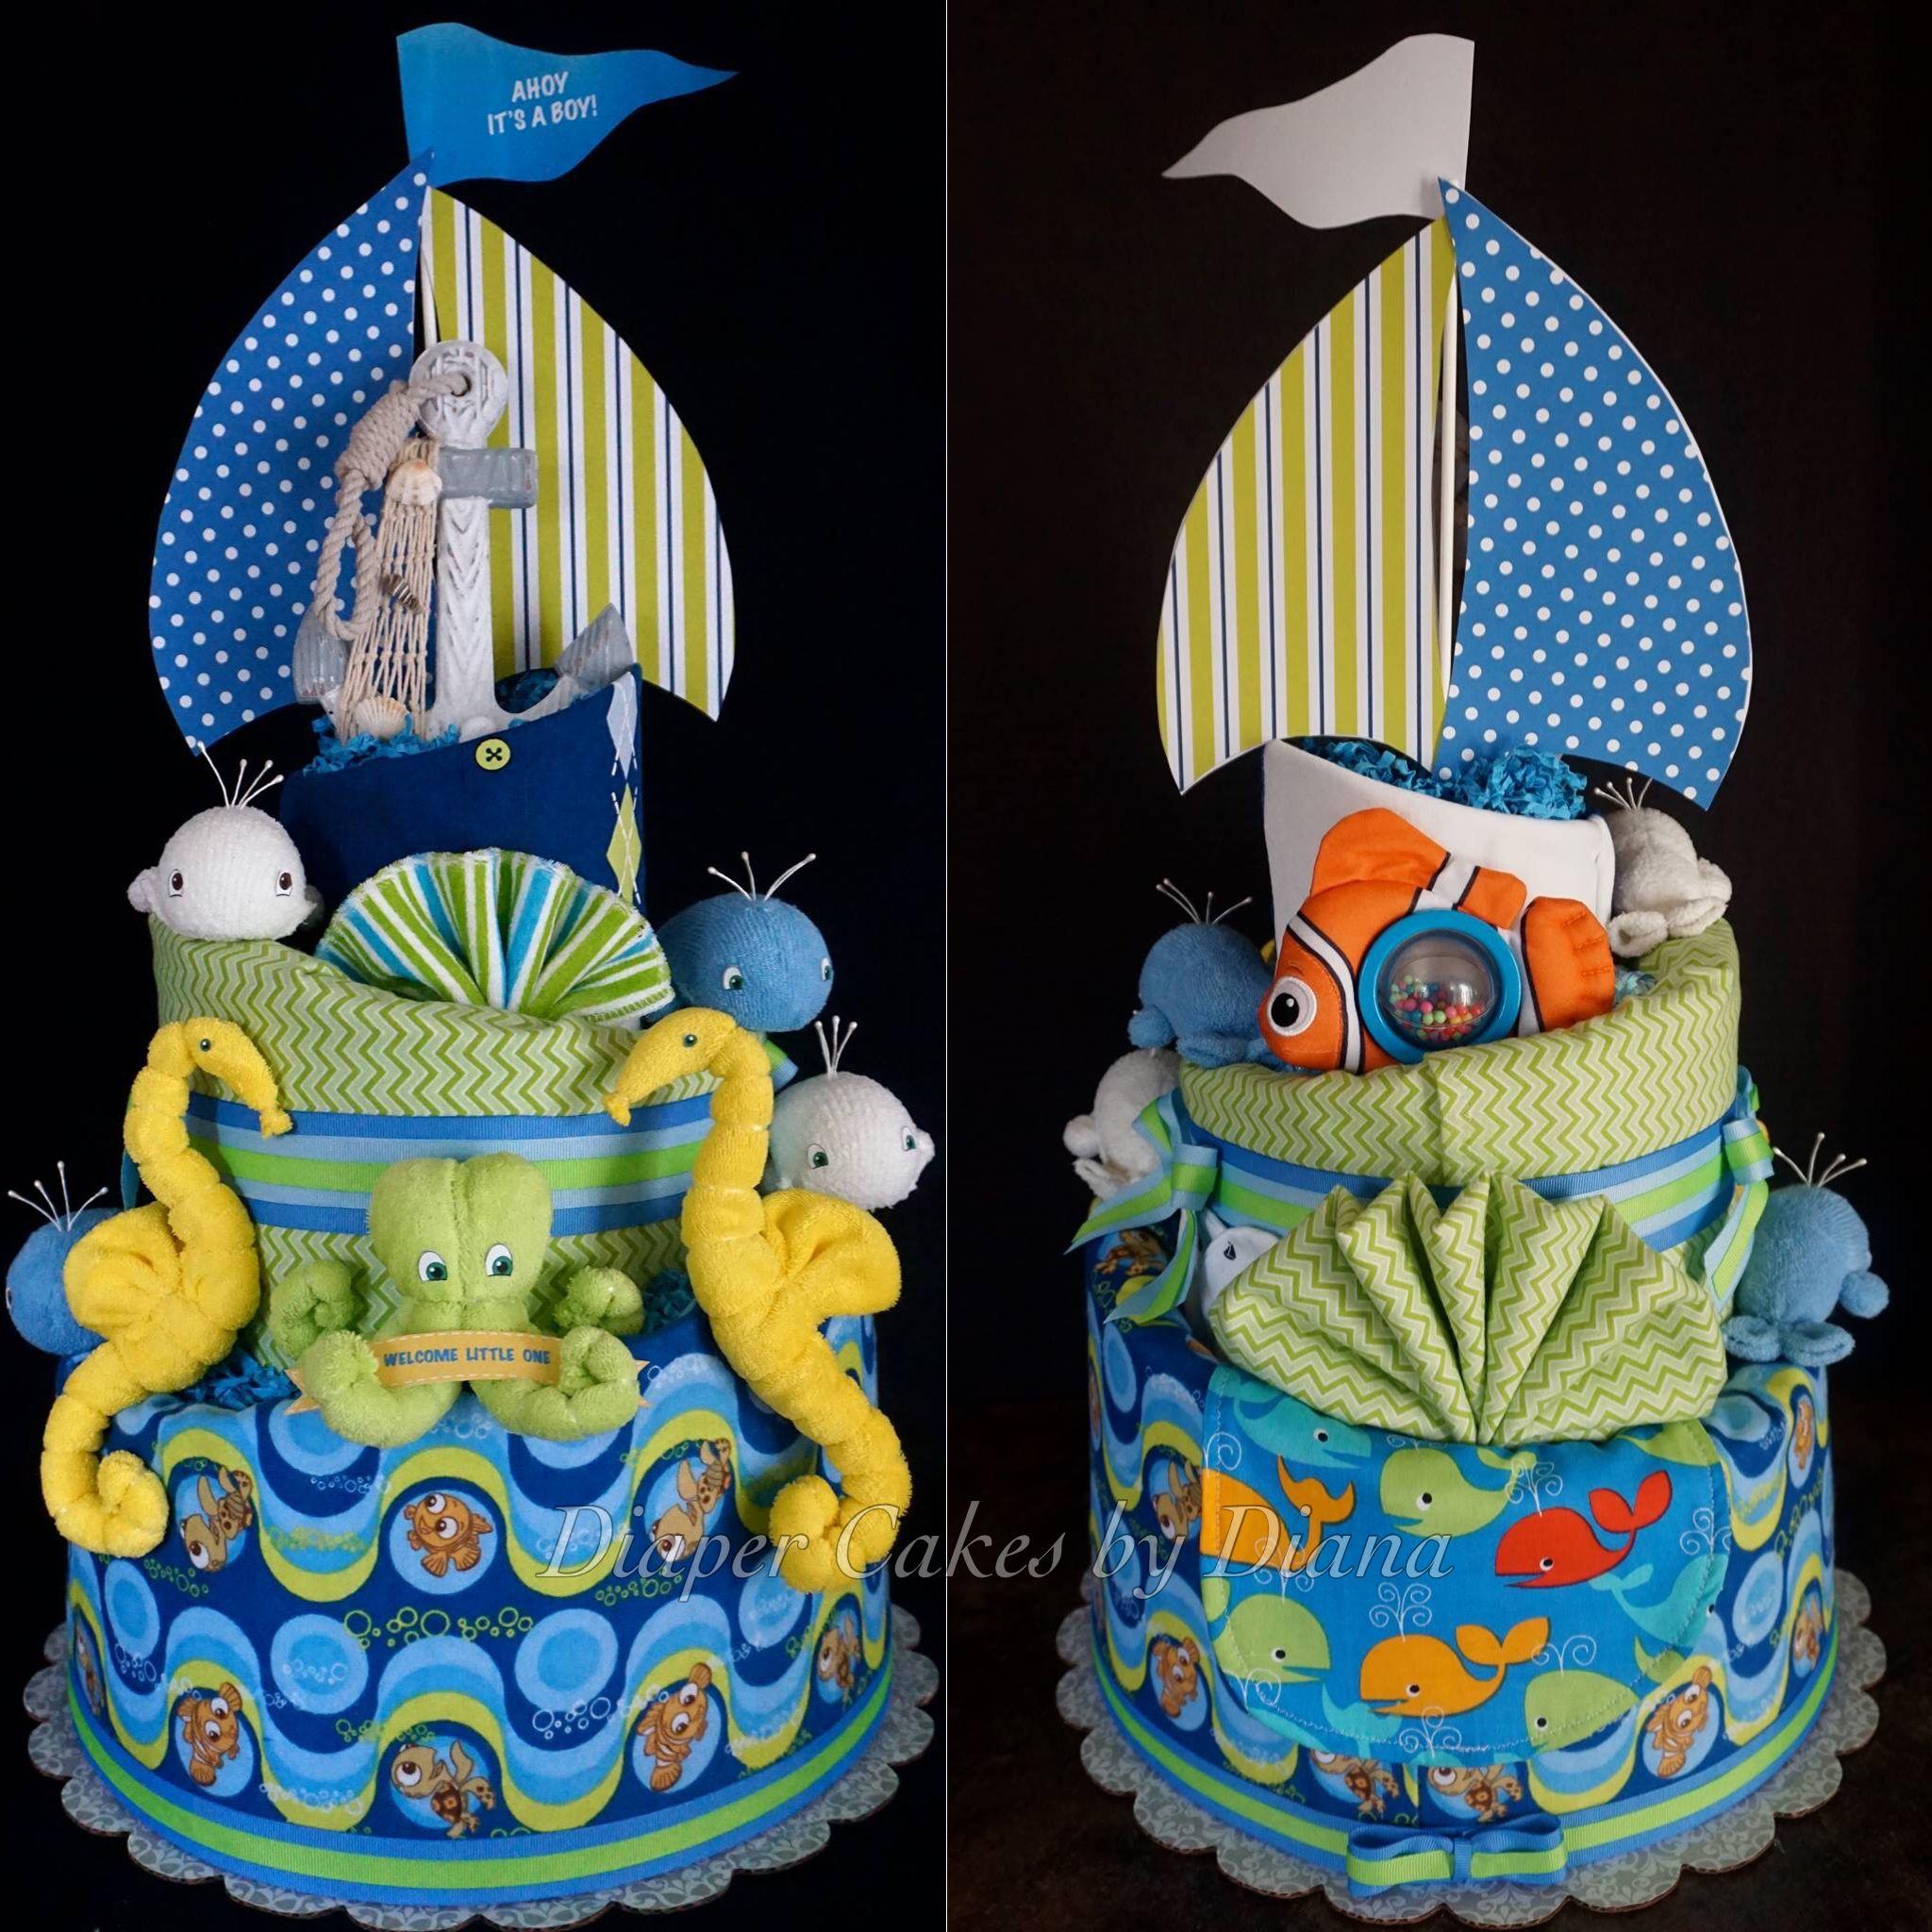 Under the Sea/Nemo themed diaper cake www.facebook.com/DiaperCakesbyDiana